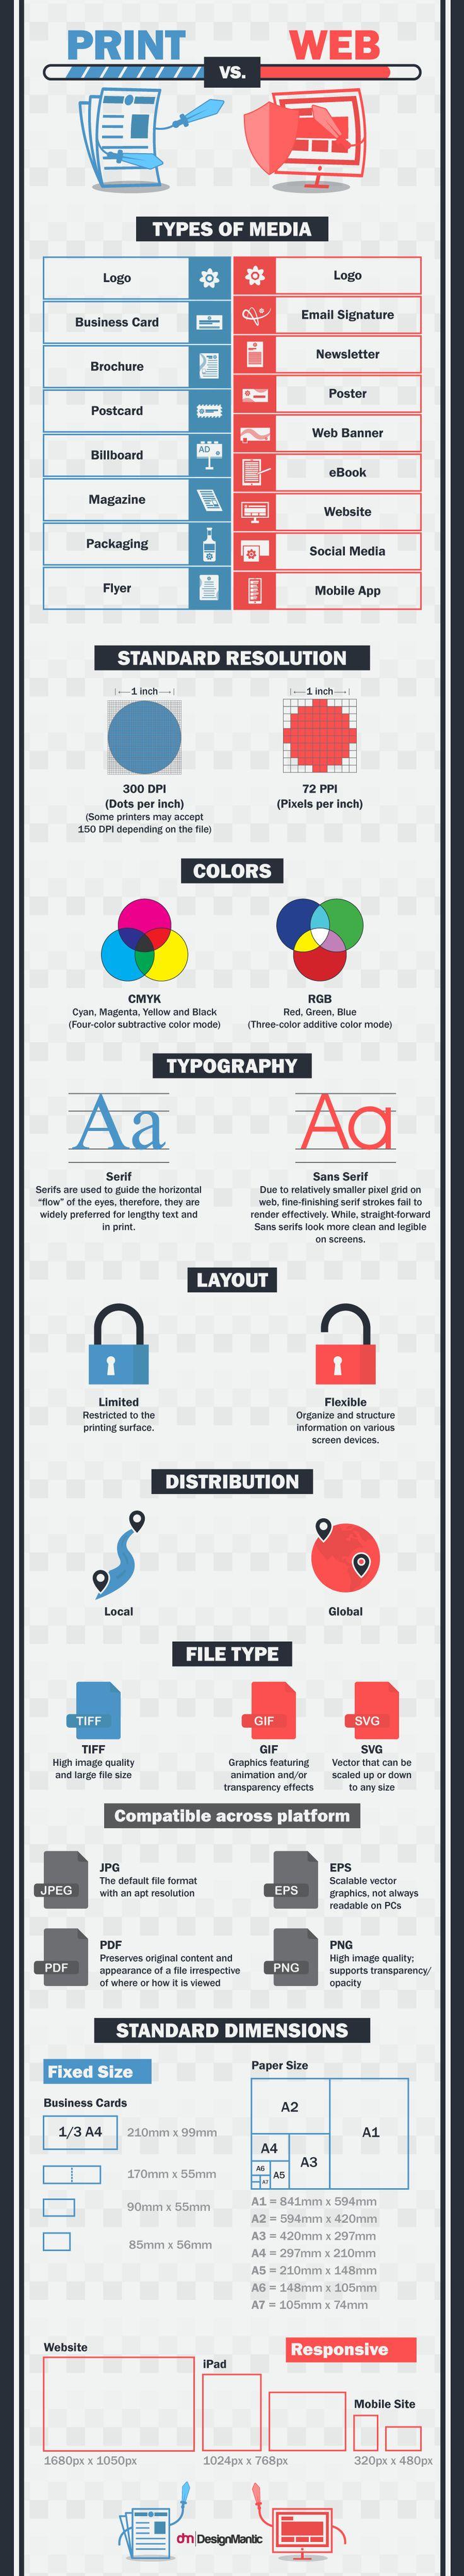 Print vs. Web Design | https://www.designmantic.com/blog/infographics/print-vs-web-design/